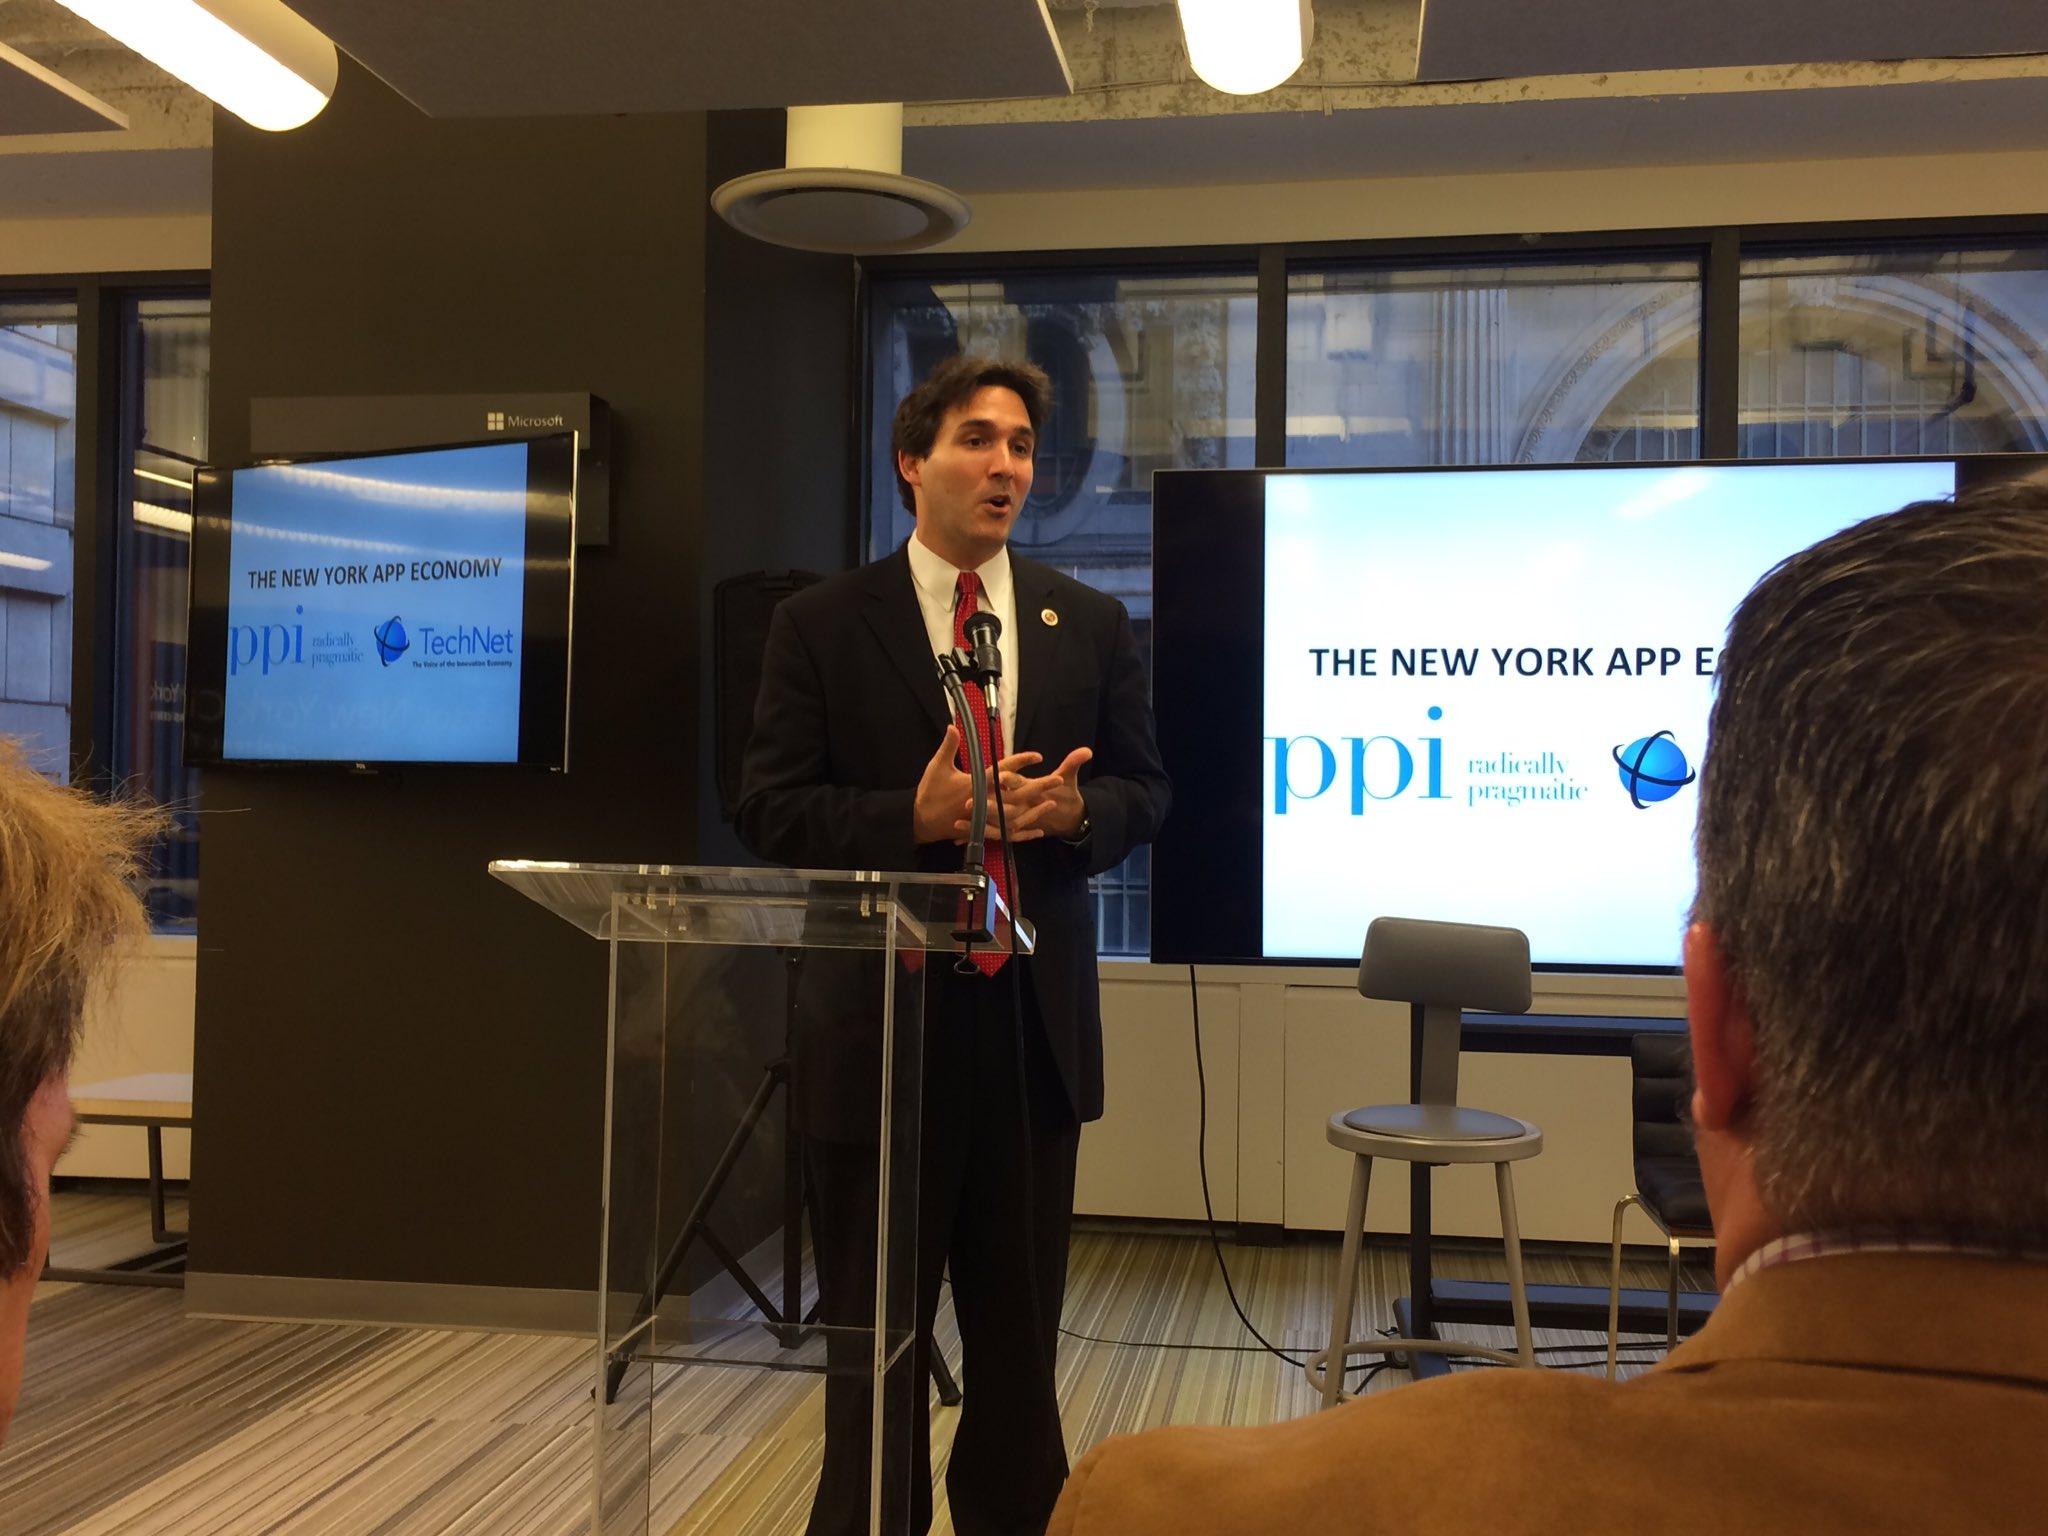 NYC Councilman Ben Kallos: want to modernize government using apps @BenKallos #rewrite https://t.co/BQbfsYgWSJ